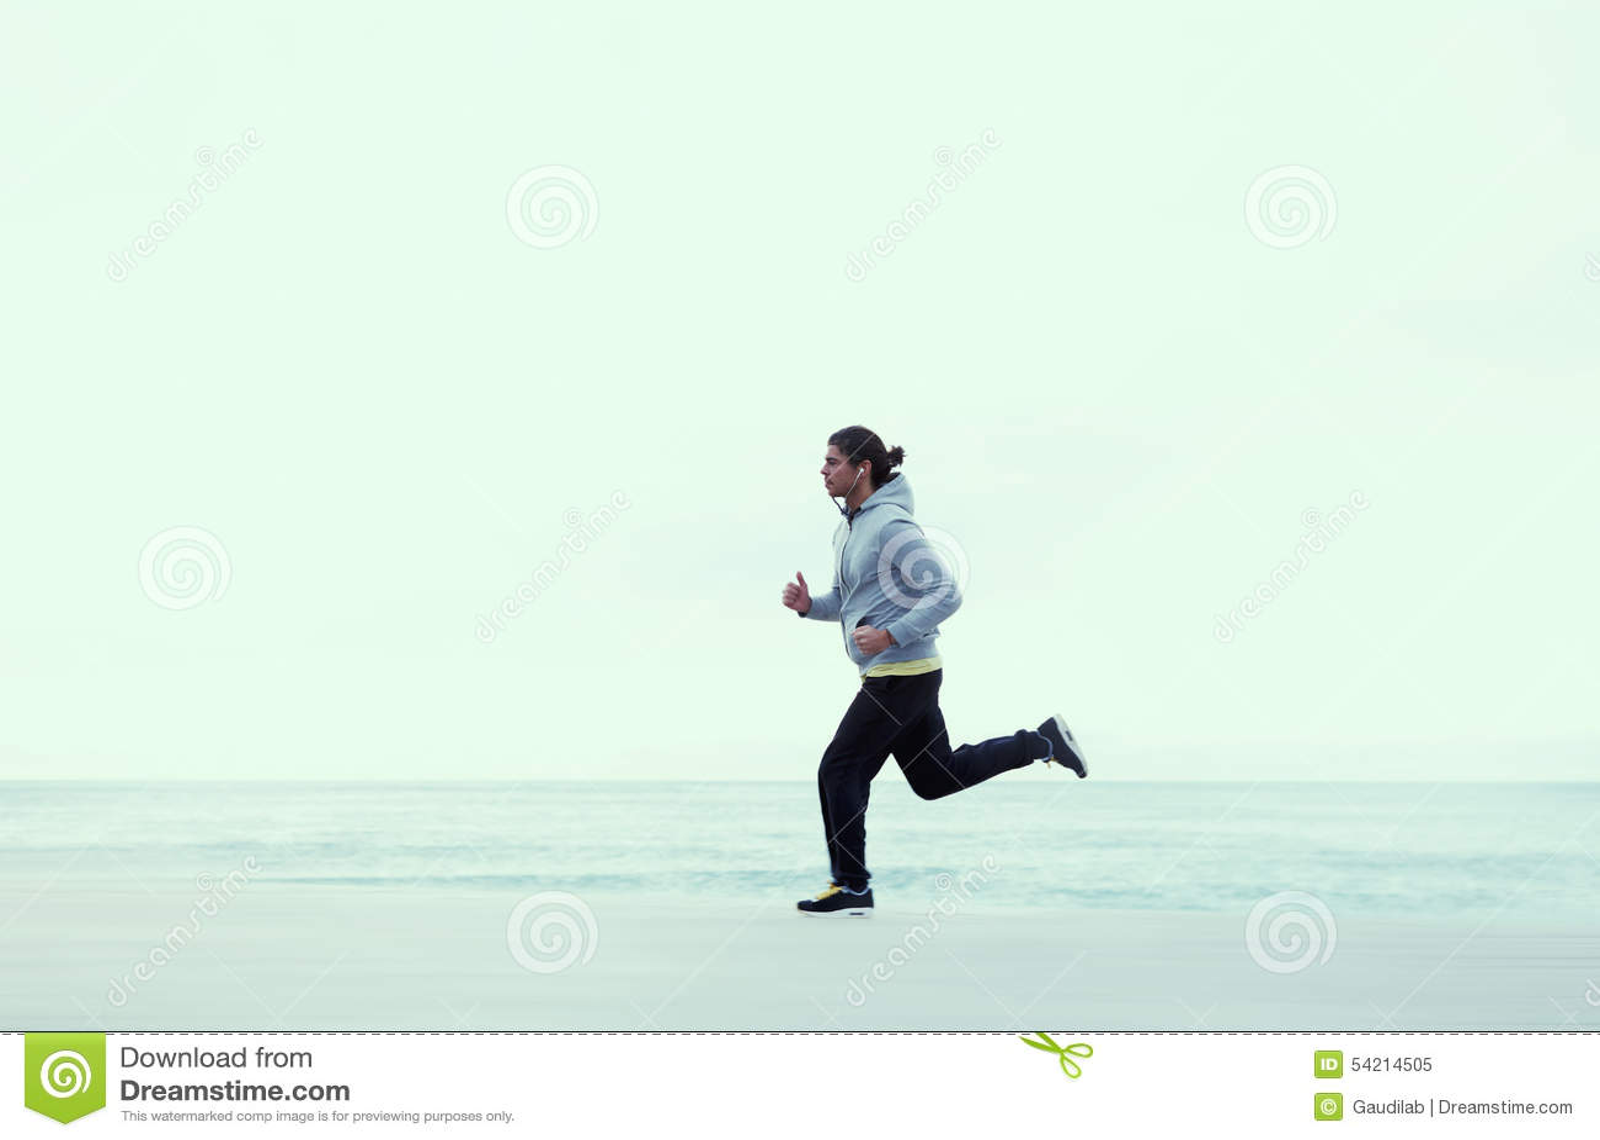 Guy runs on fresh air